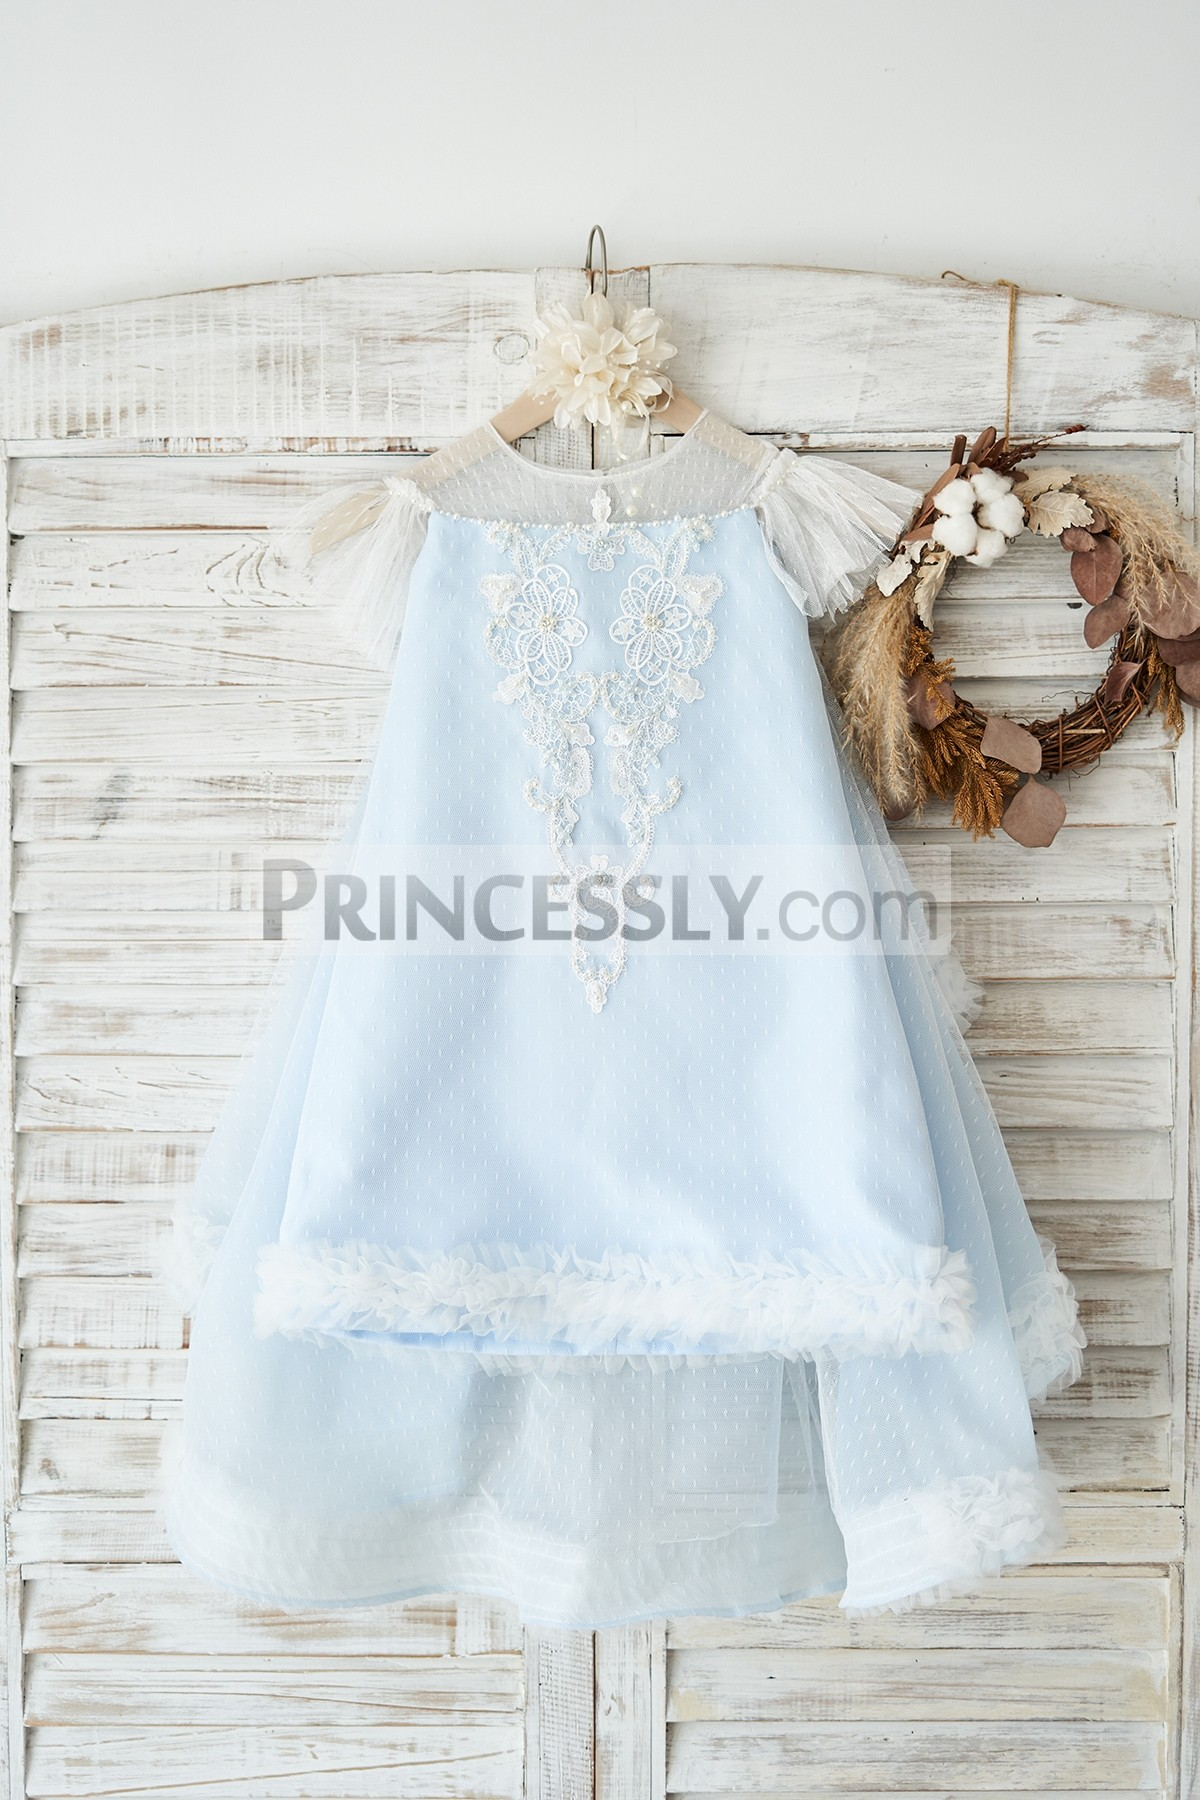 Princessly.com-K1004034-Blue Polka Dot Lace Tulle Cap Sleeves Wedding Flower Girl Dress-31